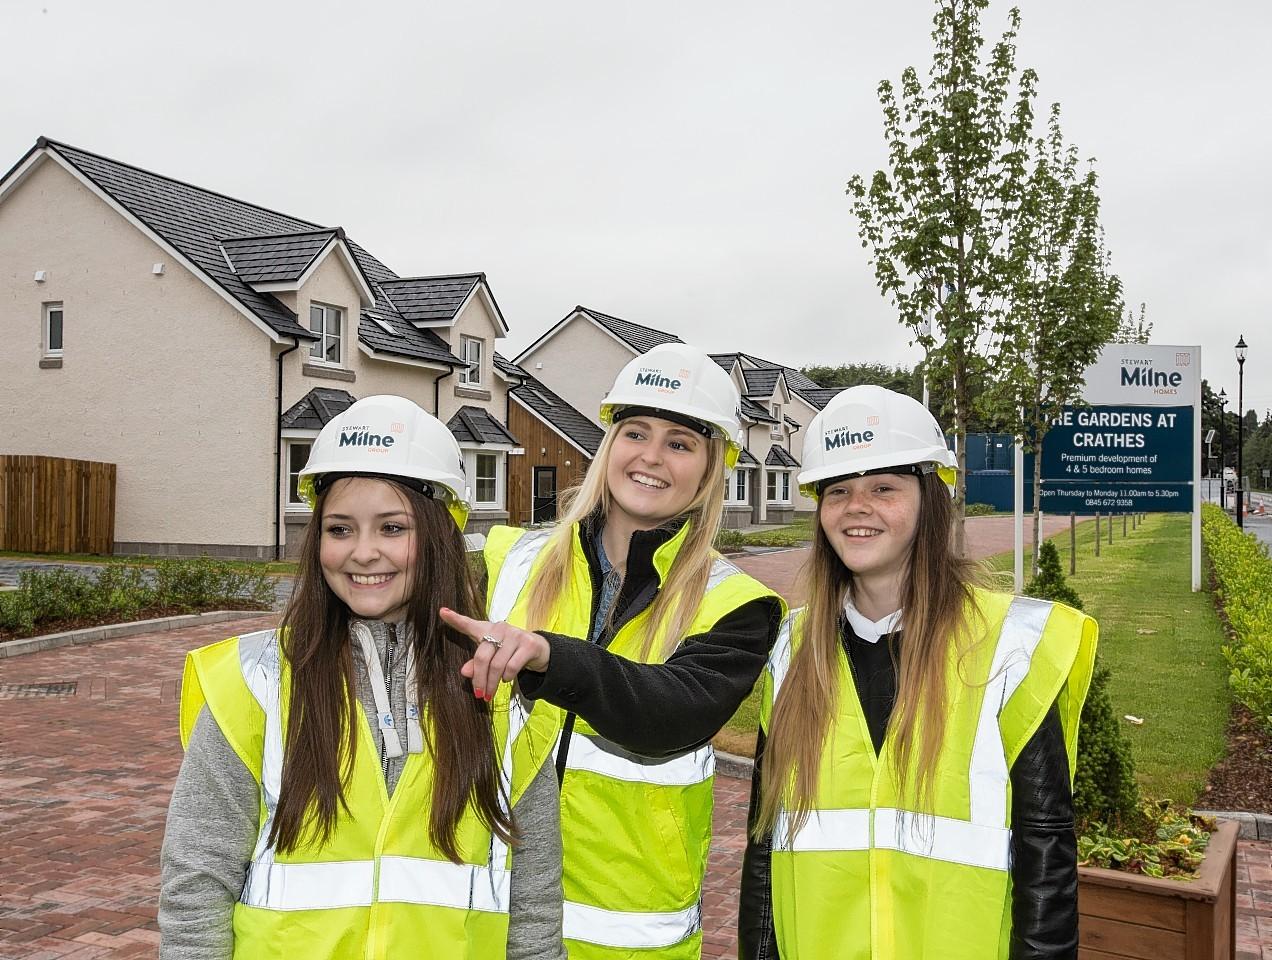 Apprentice quantity surveyor Abbie Duthie (centre) with pupils Natalia Lisowska (left) and Chloe Kelly (right)